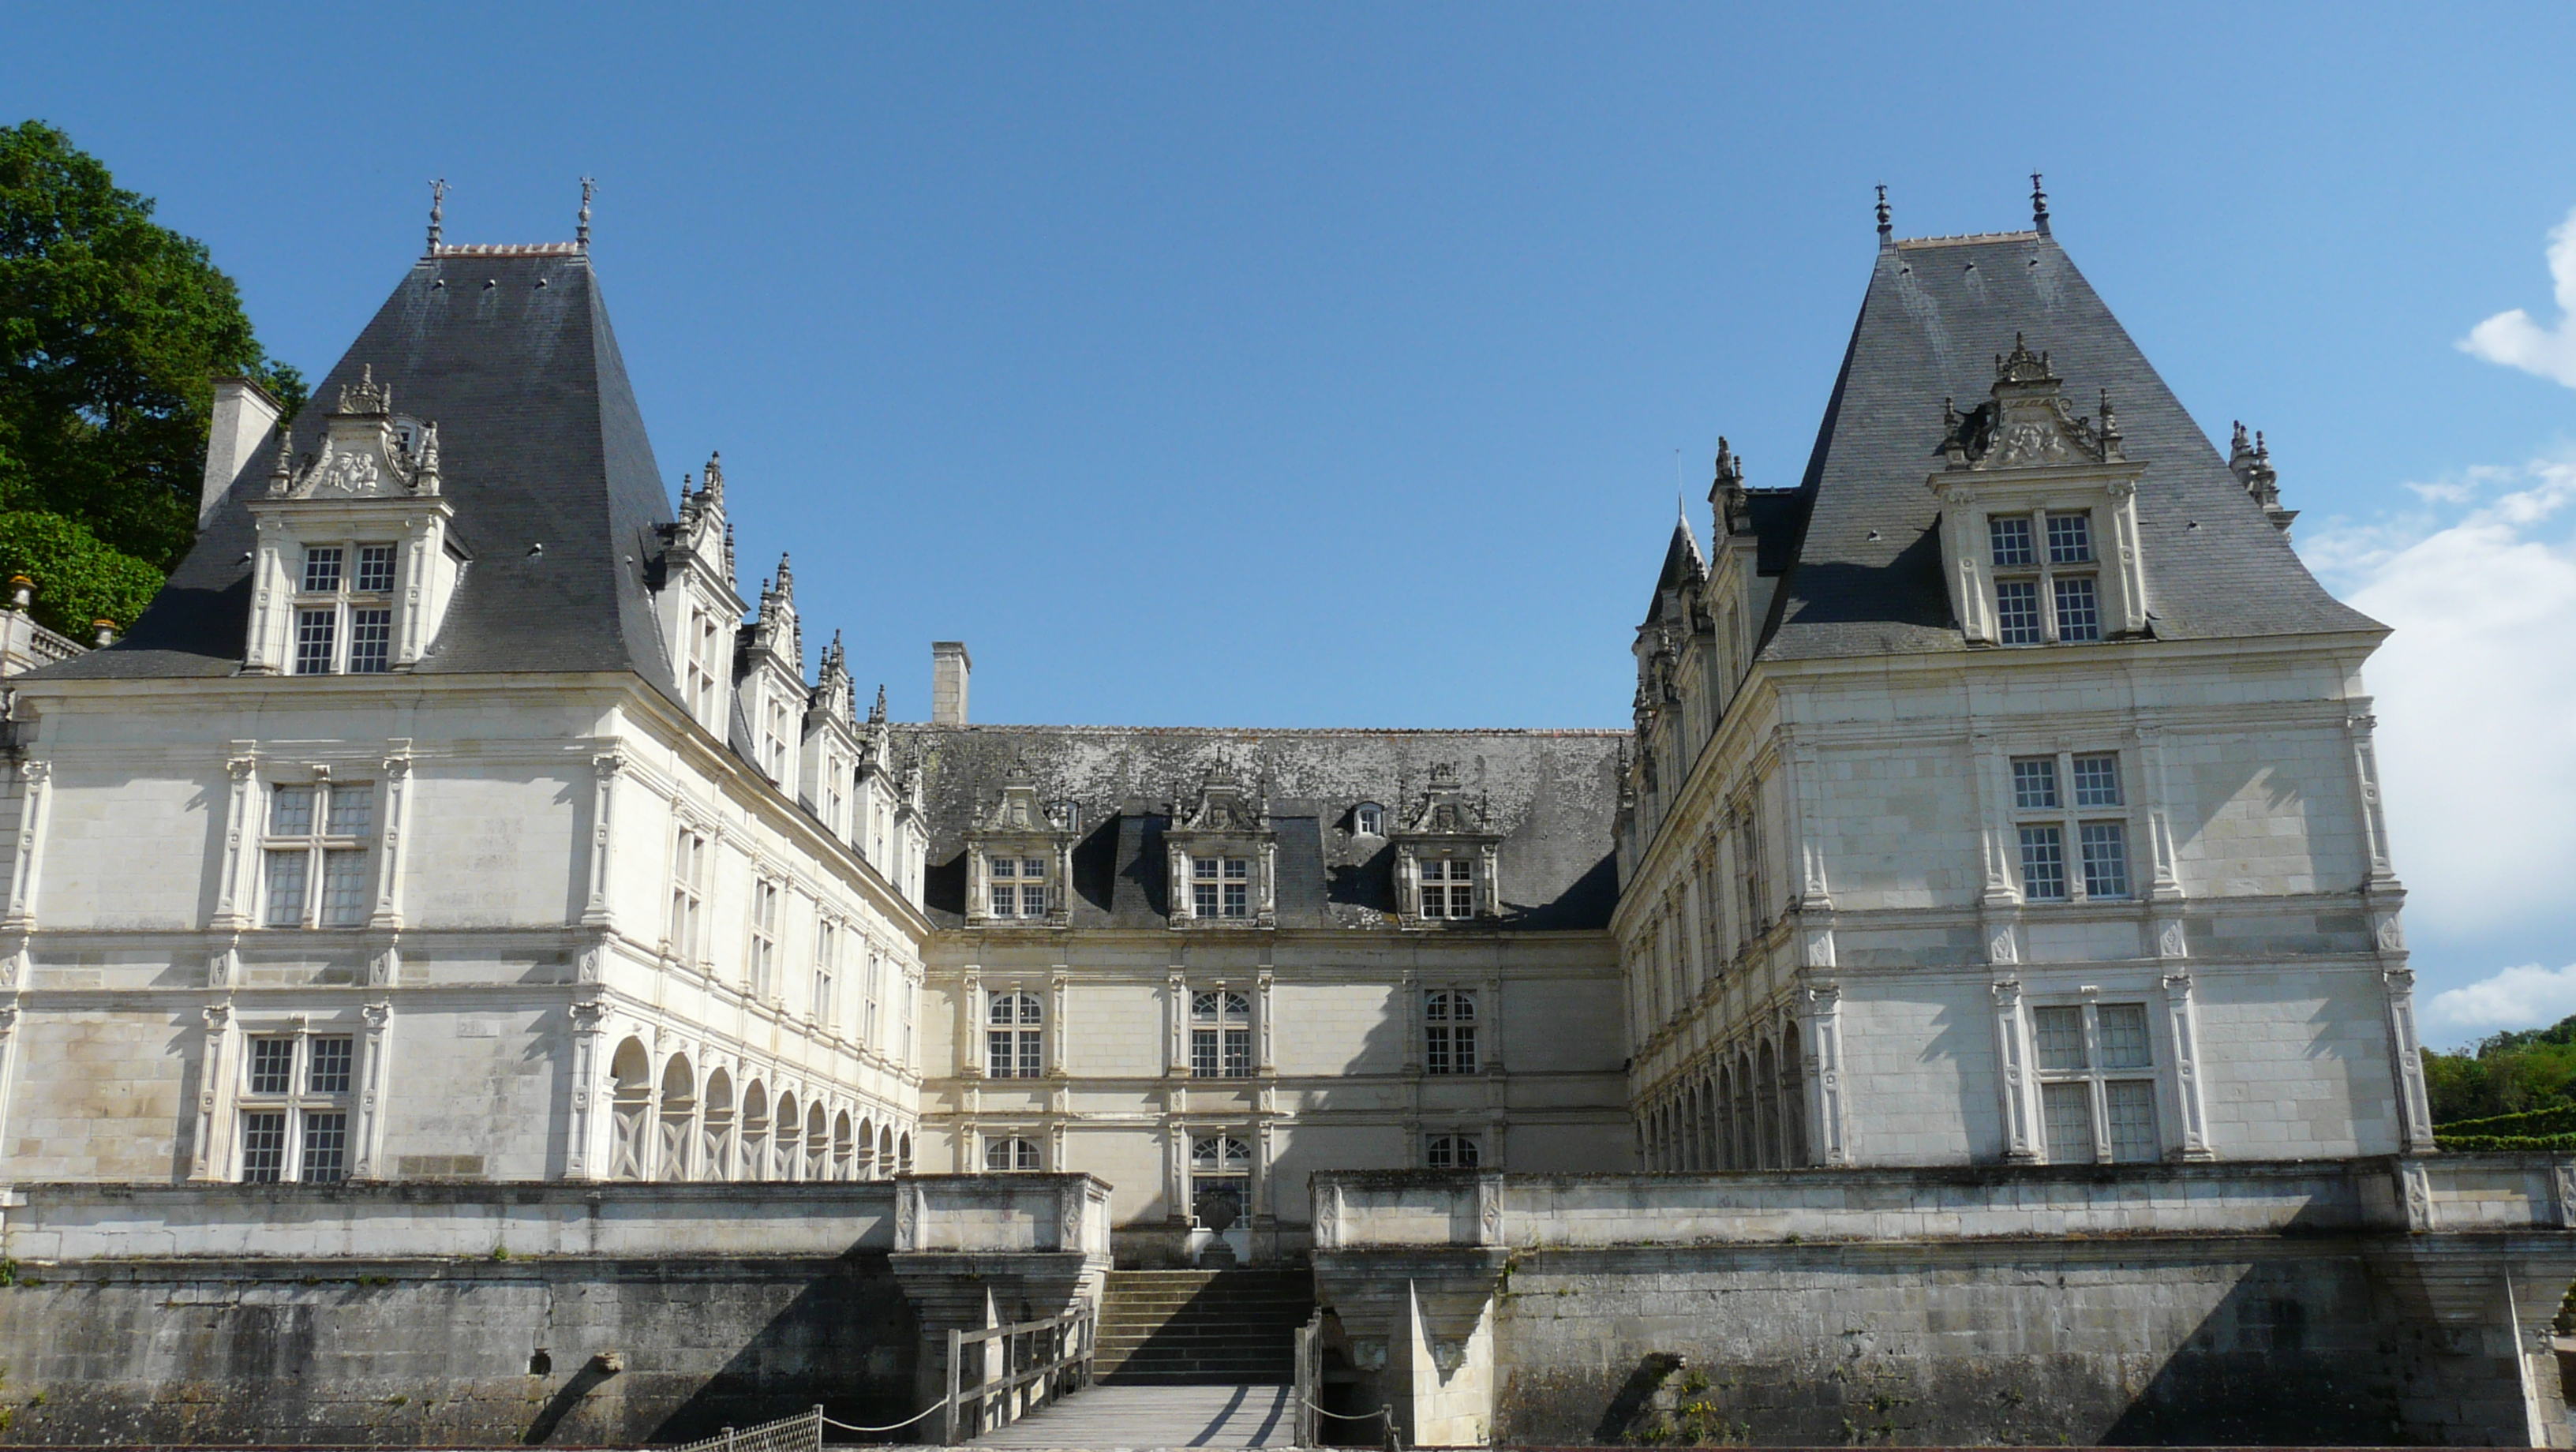 File:Chateau villandry facade.jpg - Wikimedia Commons